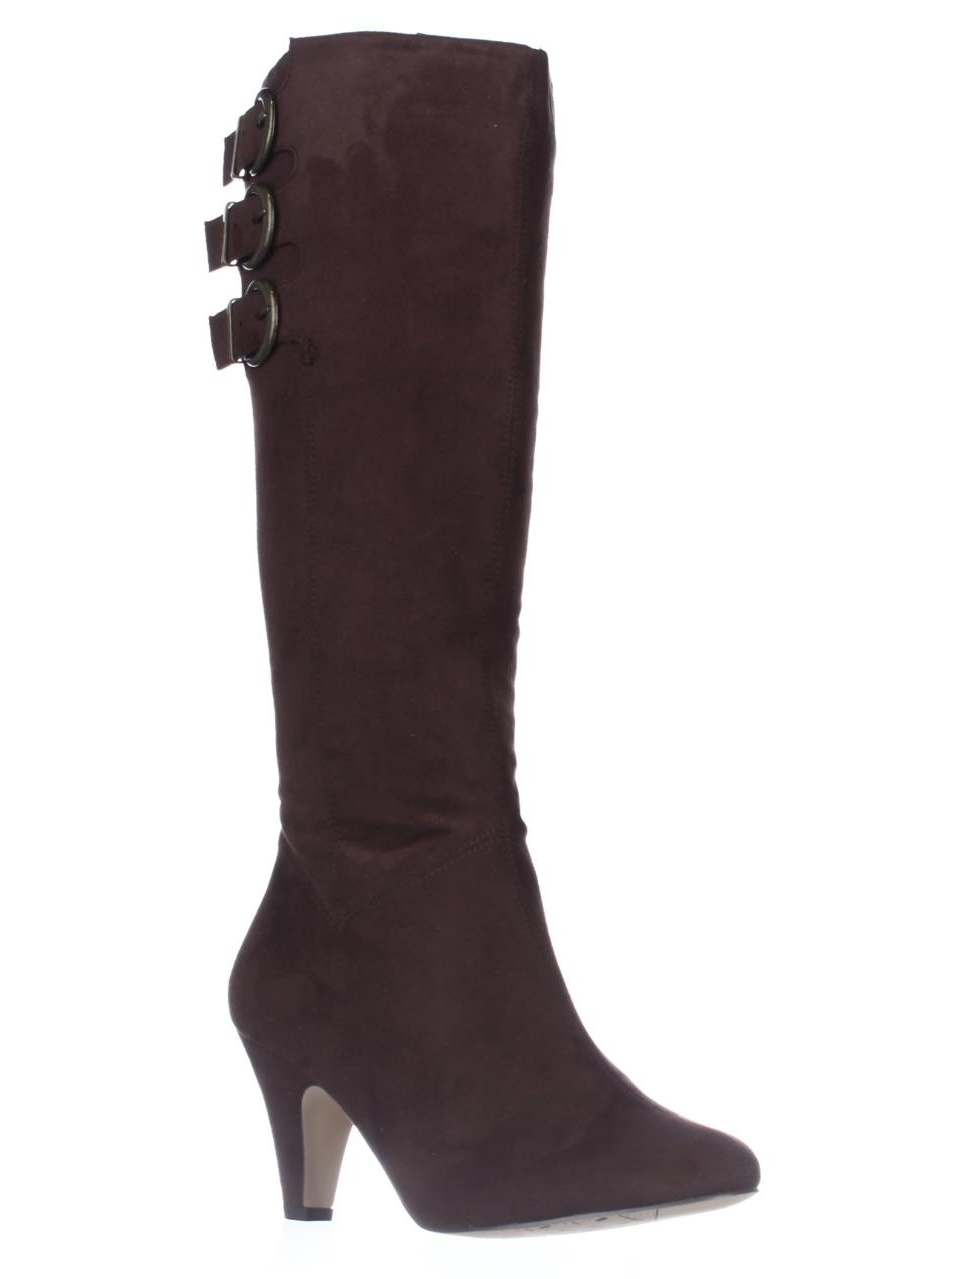 Womens Bella Vita Transit2 Knee-High Fashion Boots Brown Suede by Bella Vita